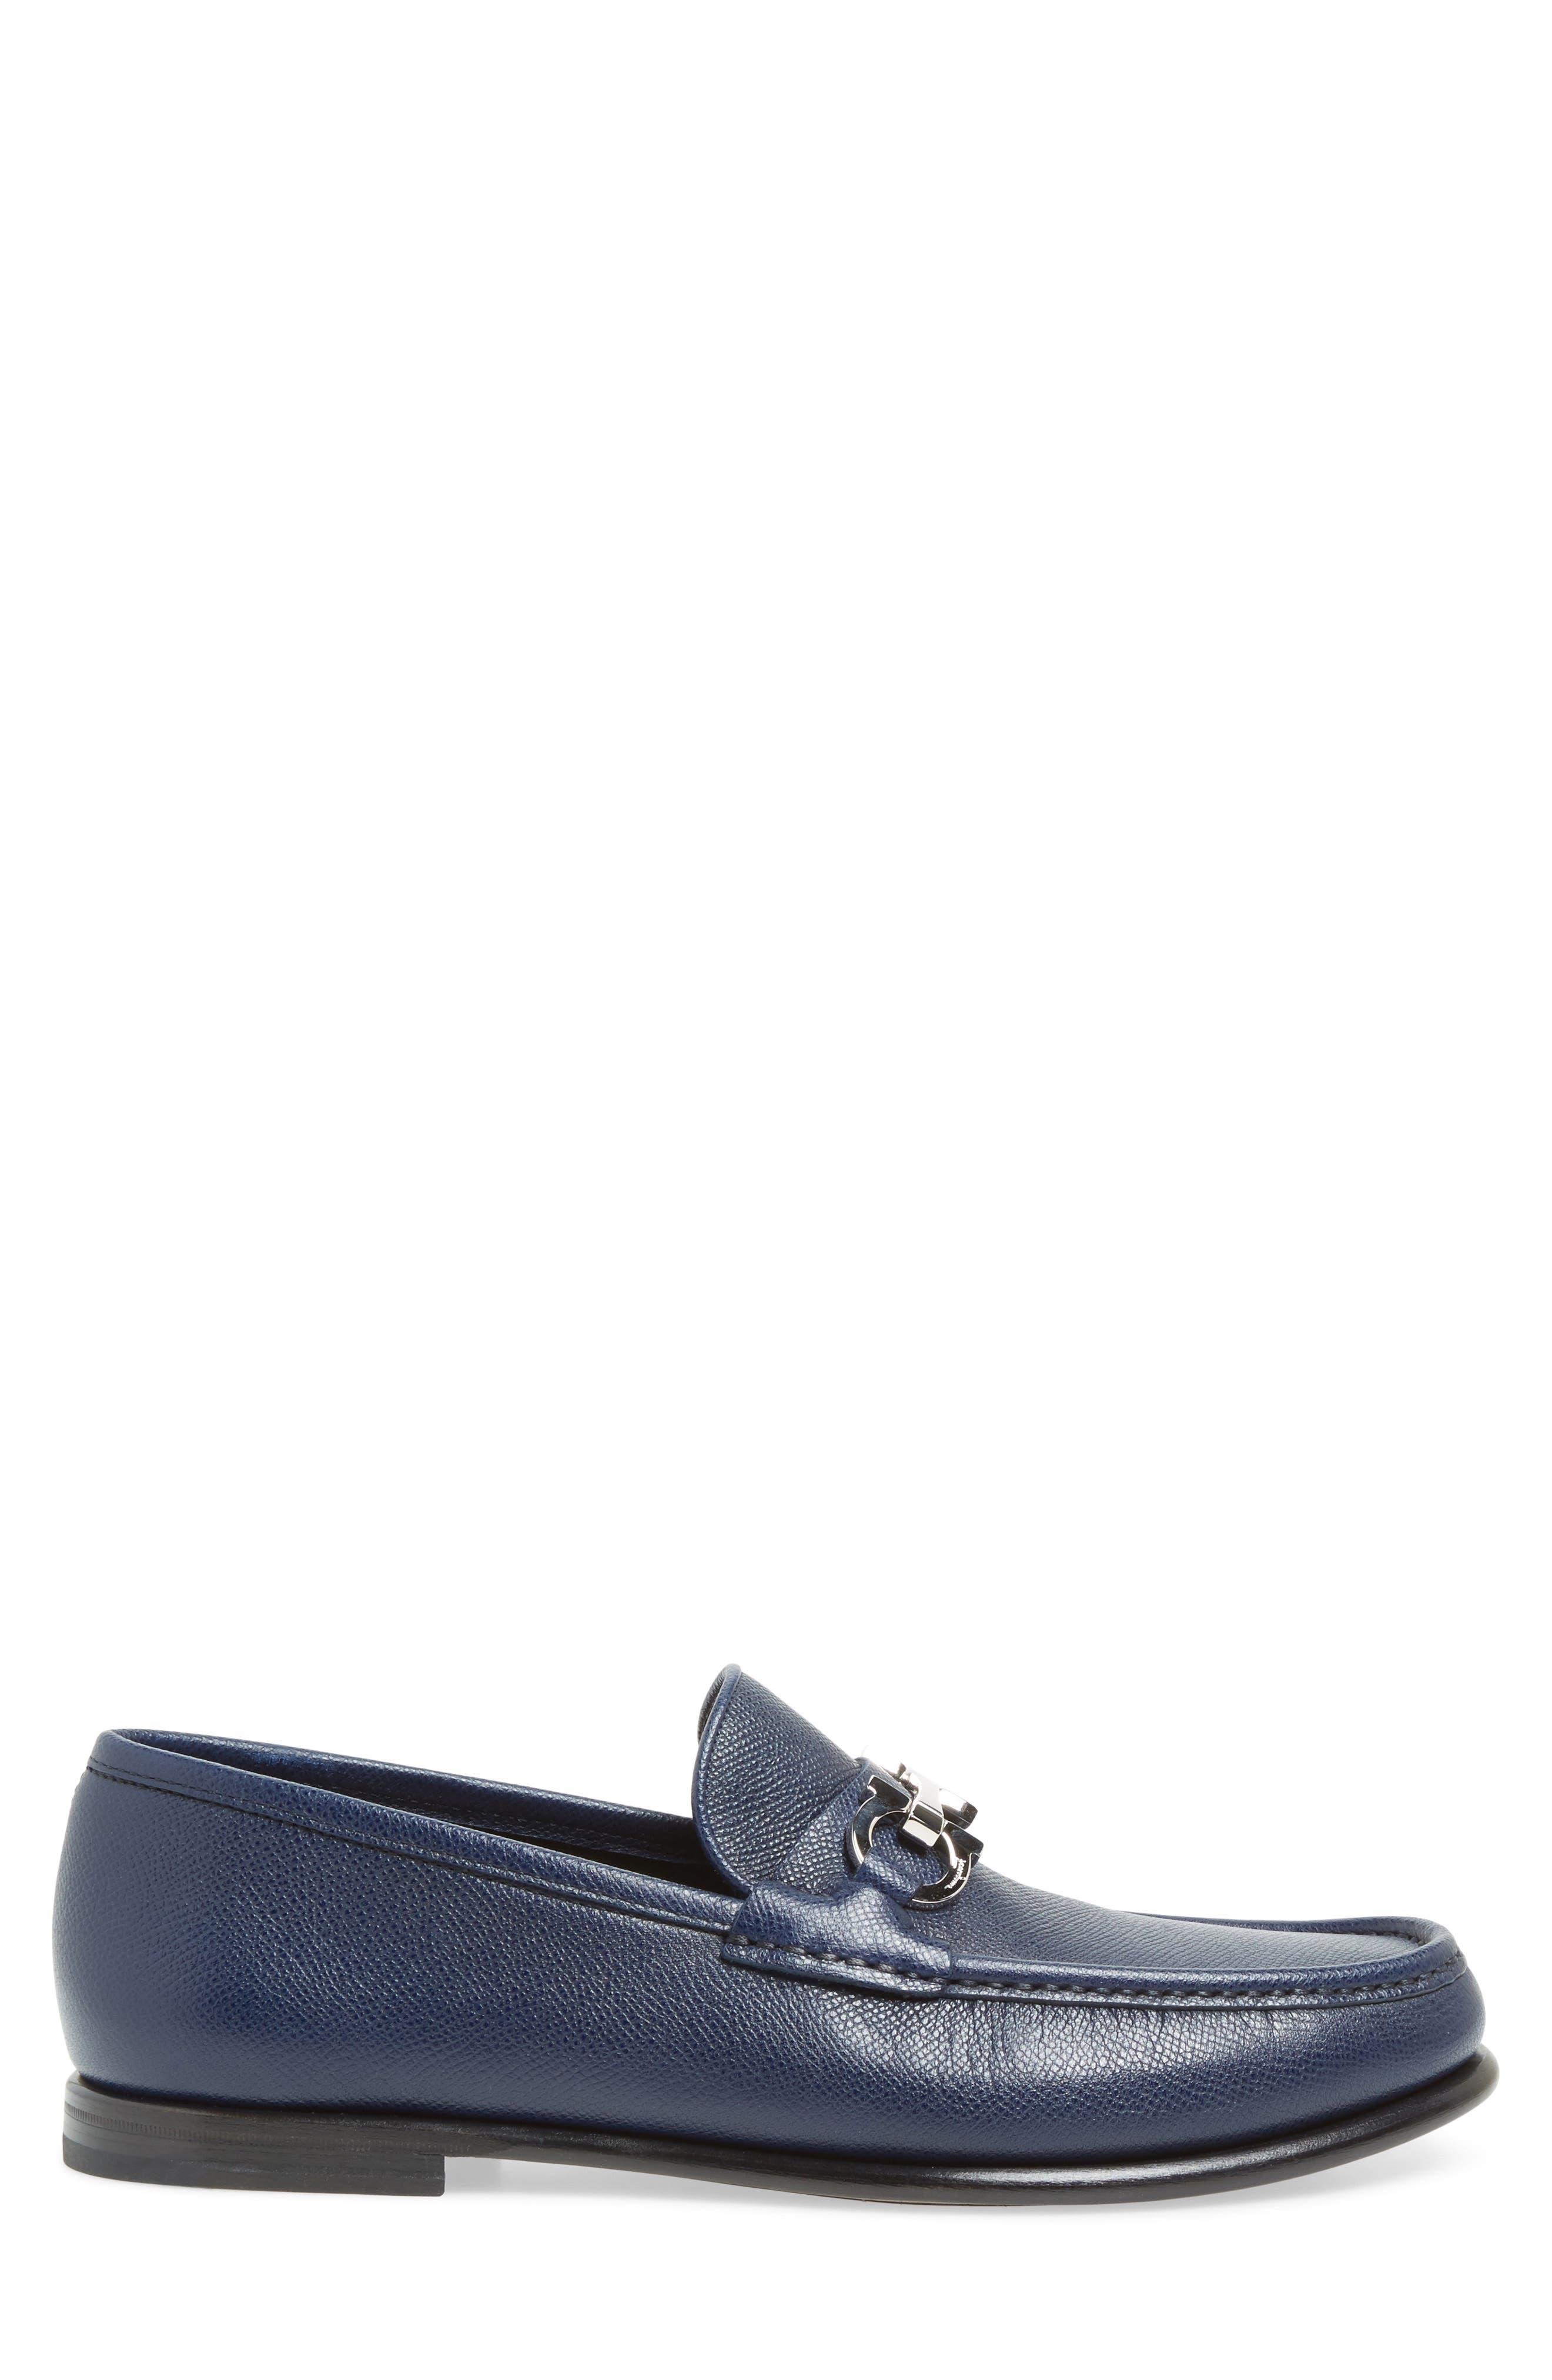 Alternate Image 3  - Salvatore Ferragamo Crown Bit Loafer (Men)